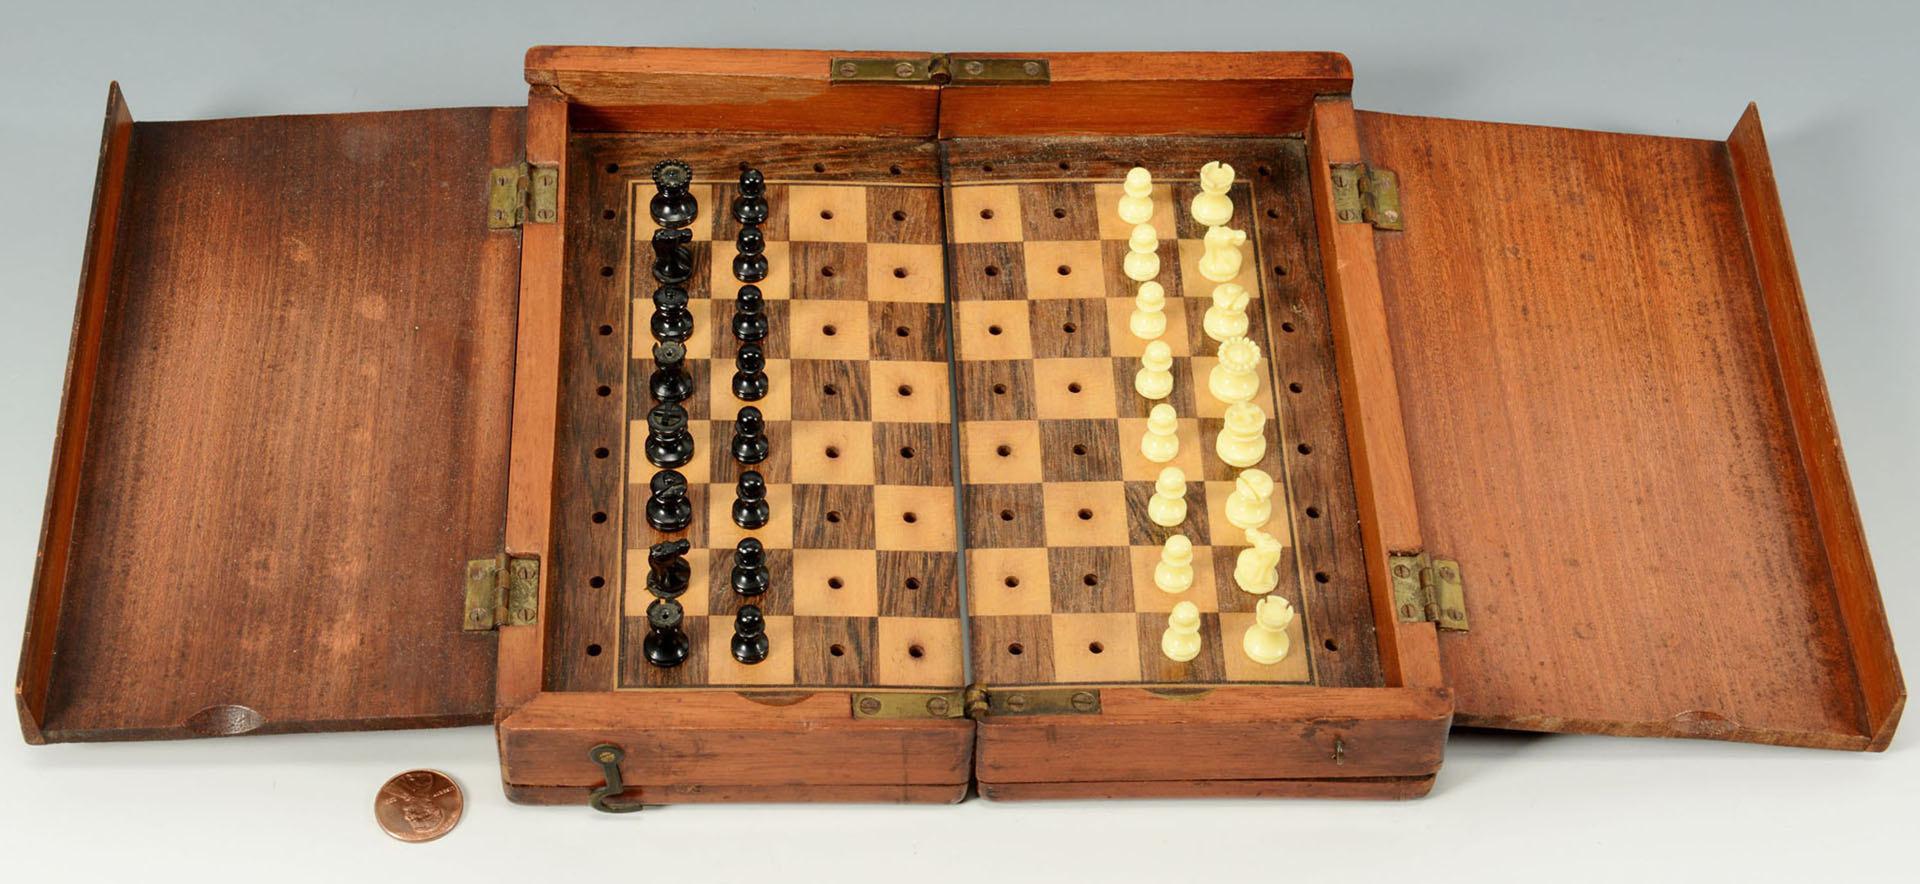 Lot 3088334: Folding Travel Chess Set